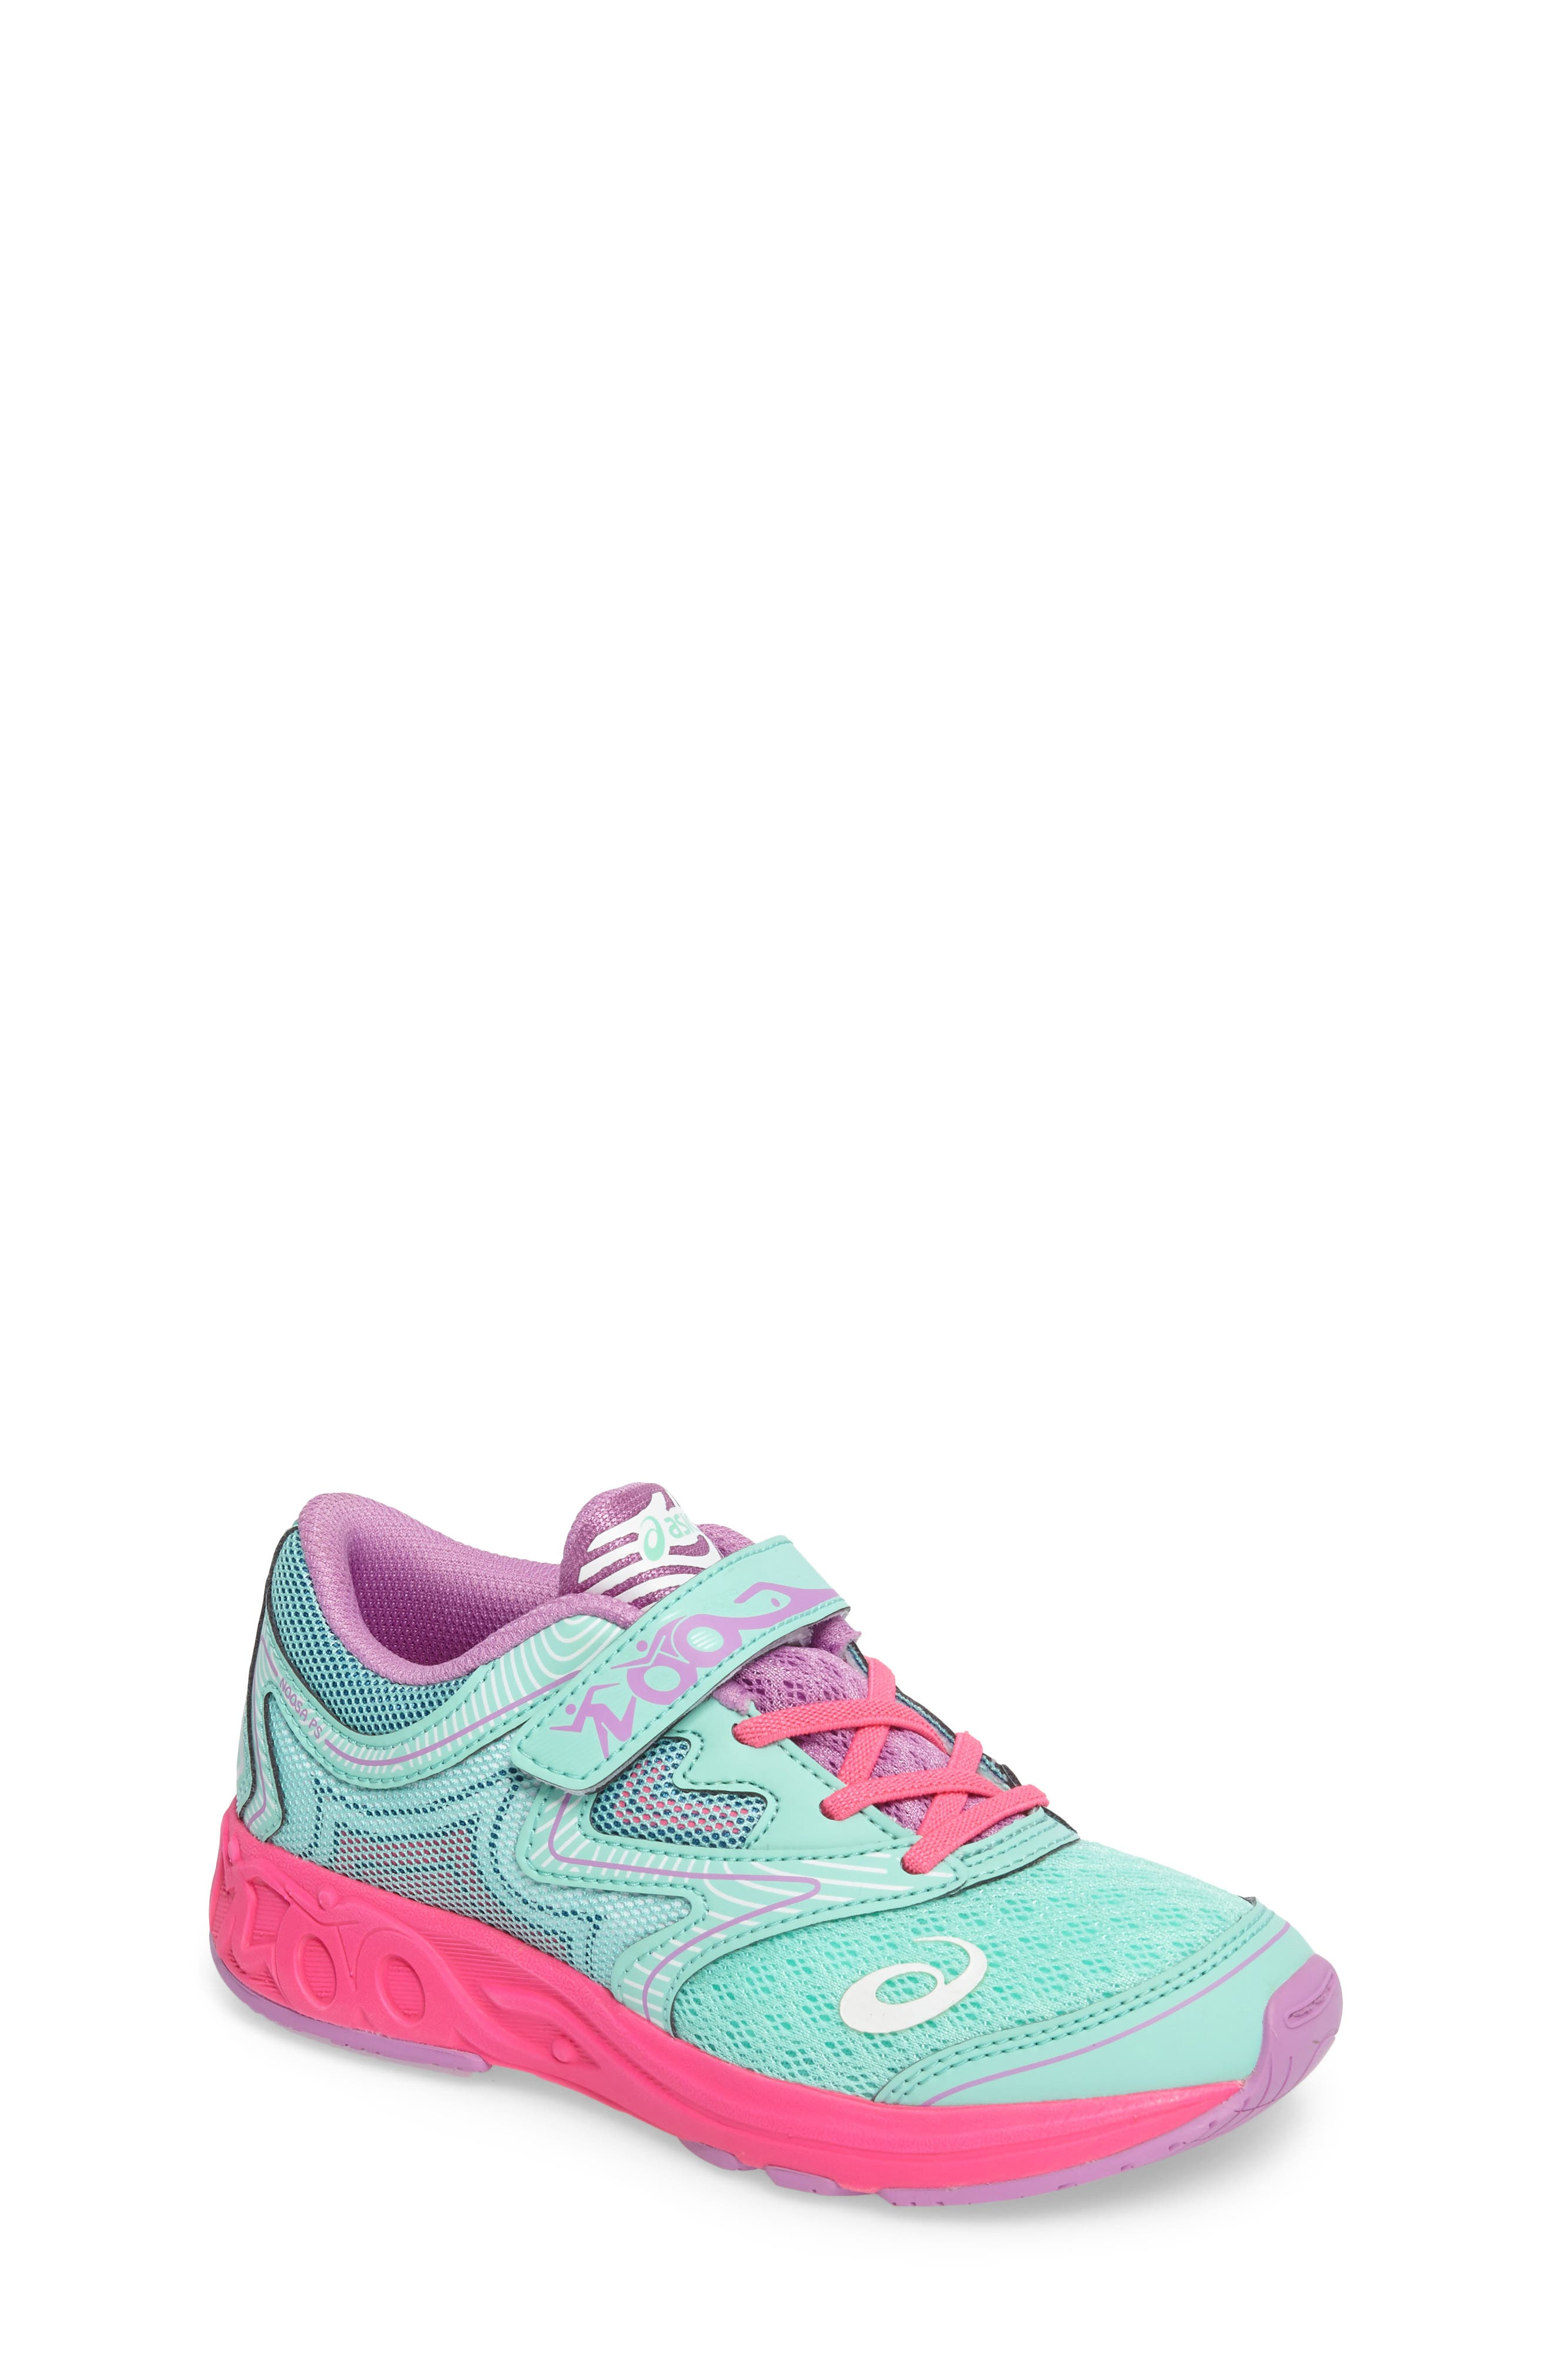 ASICS<SUP>®</SUP> Noosa PS Sneaker